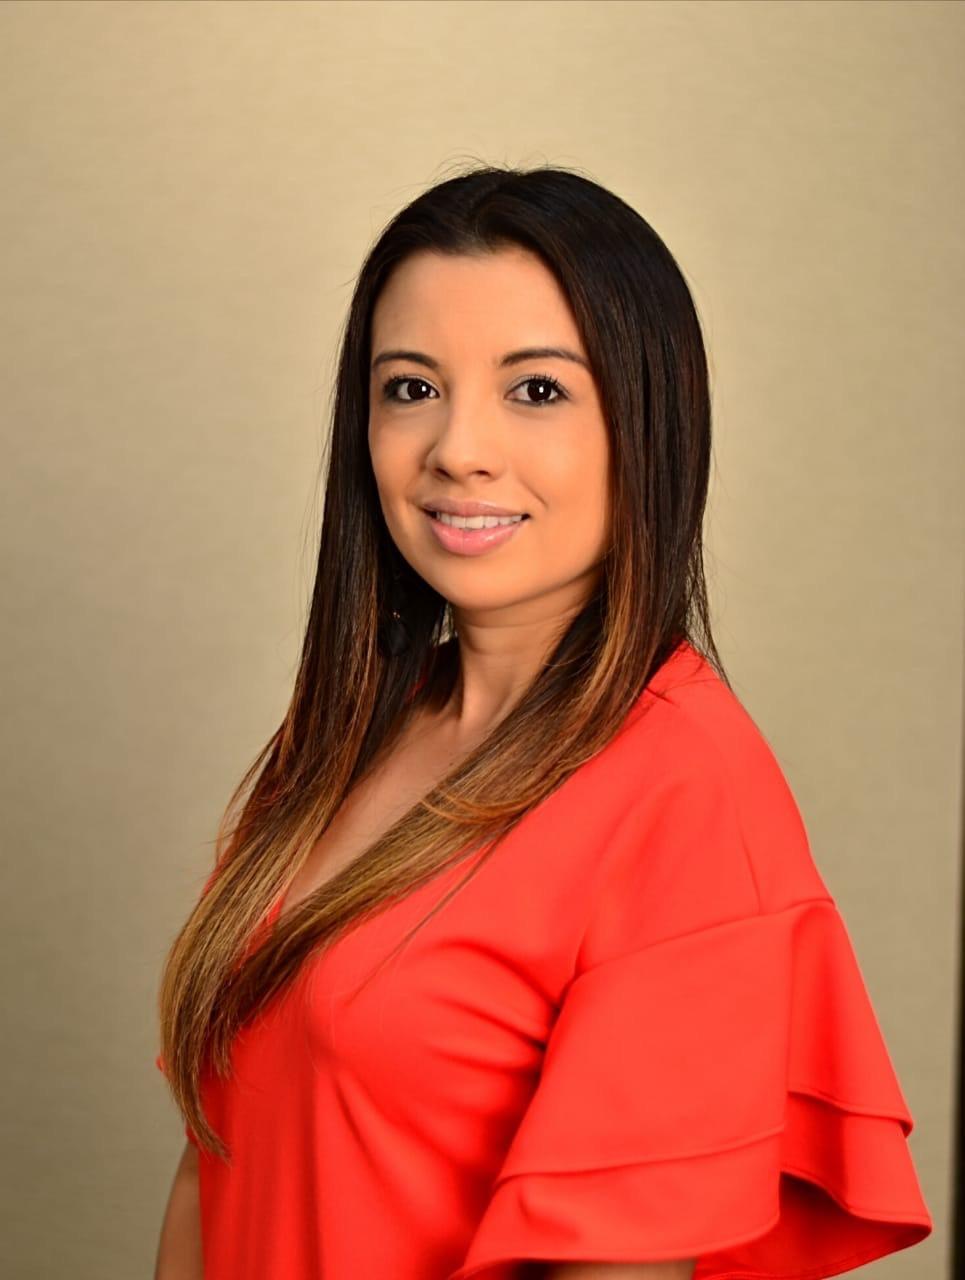 Charmex nombra a Carolina Triana nueva responsable de Ventas en América Latina